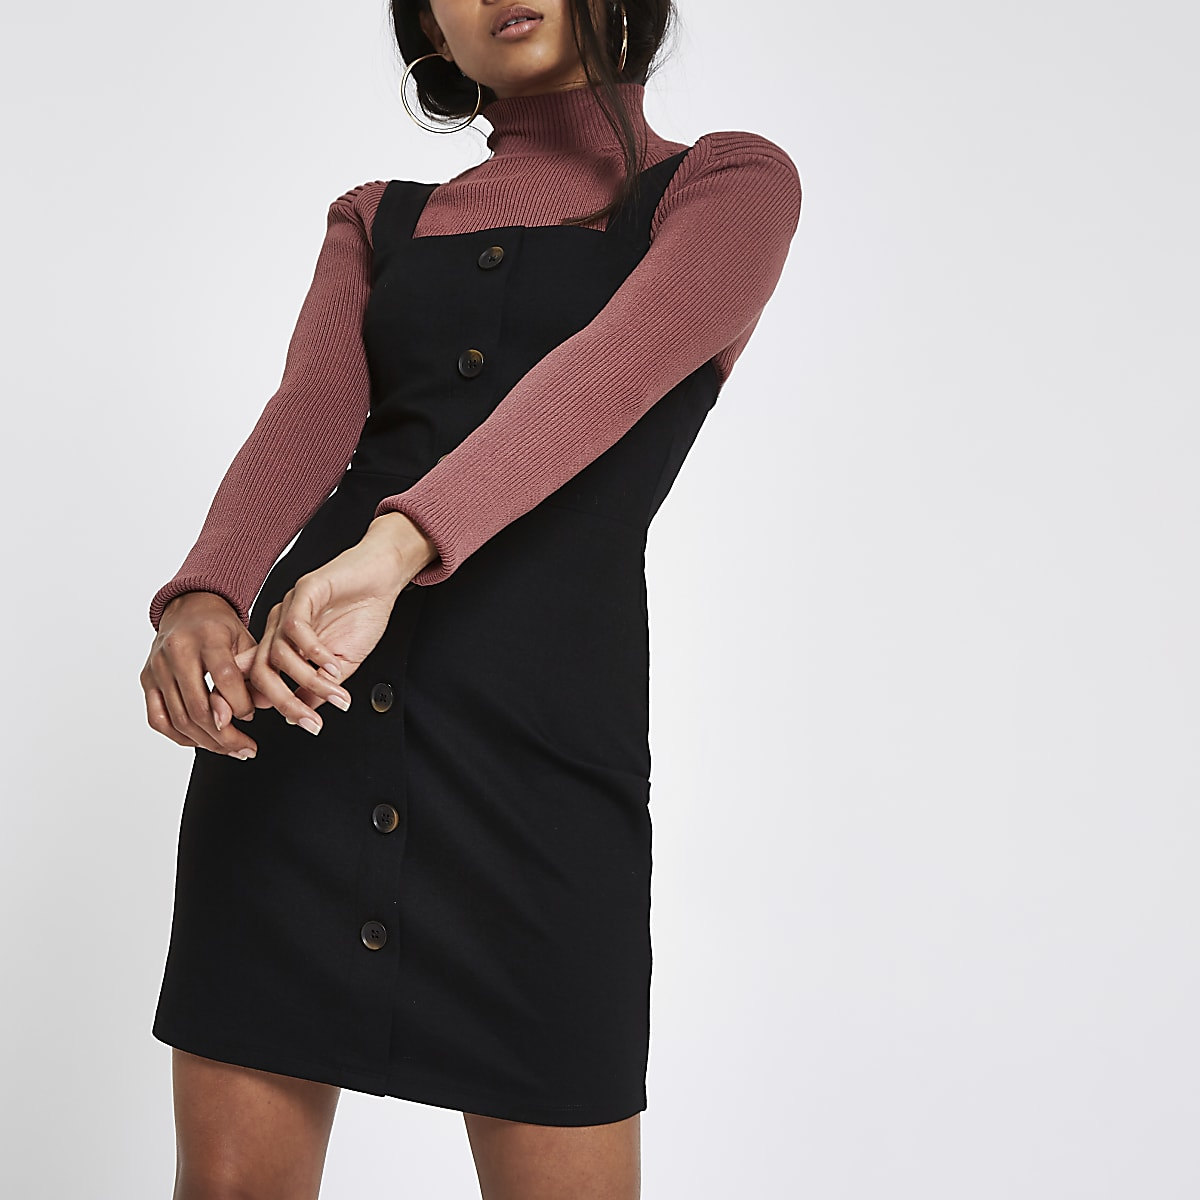 Petite black bodycon button up mini dress